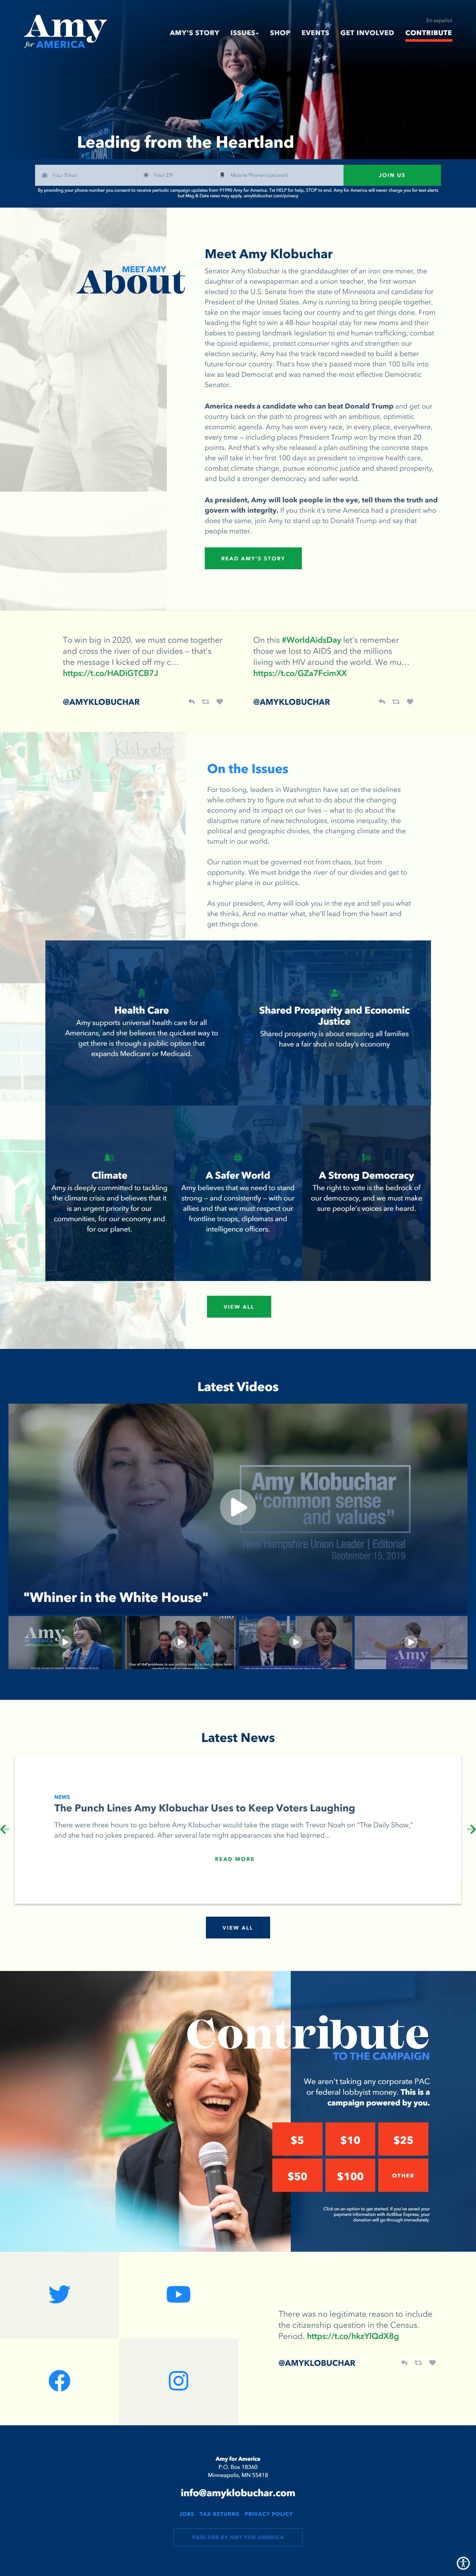 Homepage Snapshot for December 1, 2019: Senator Amy Klobuchar